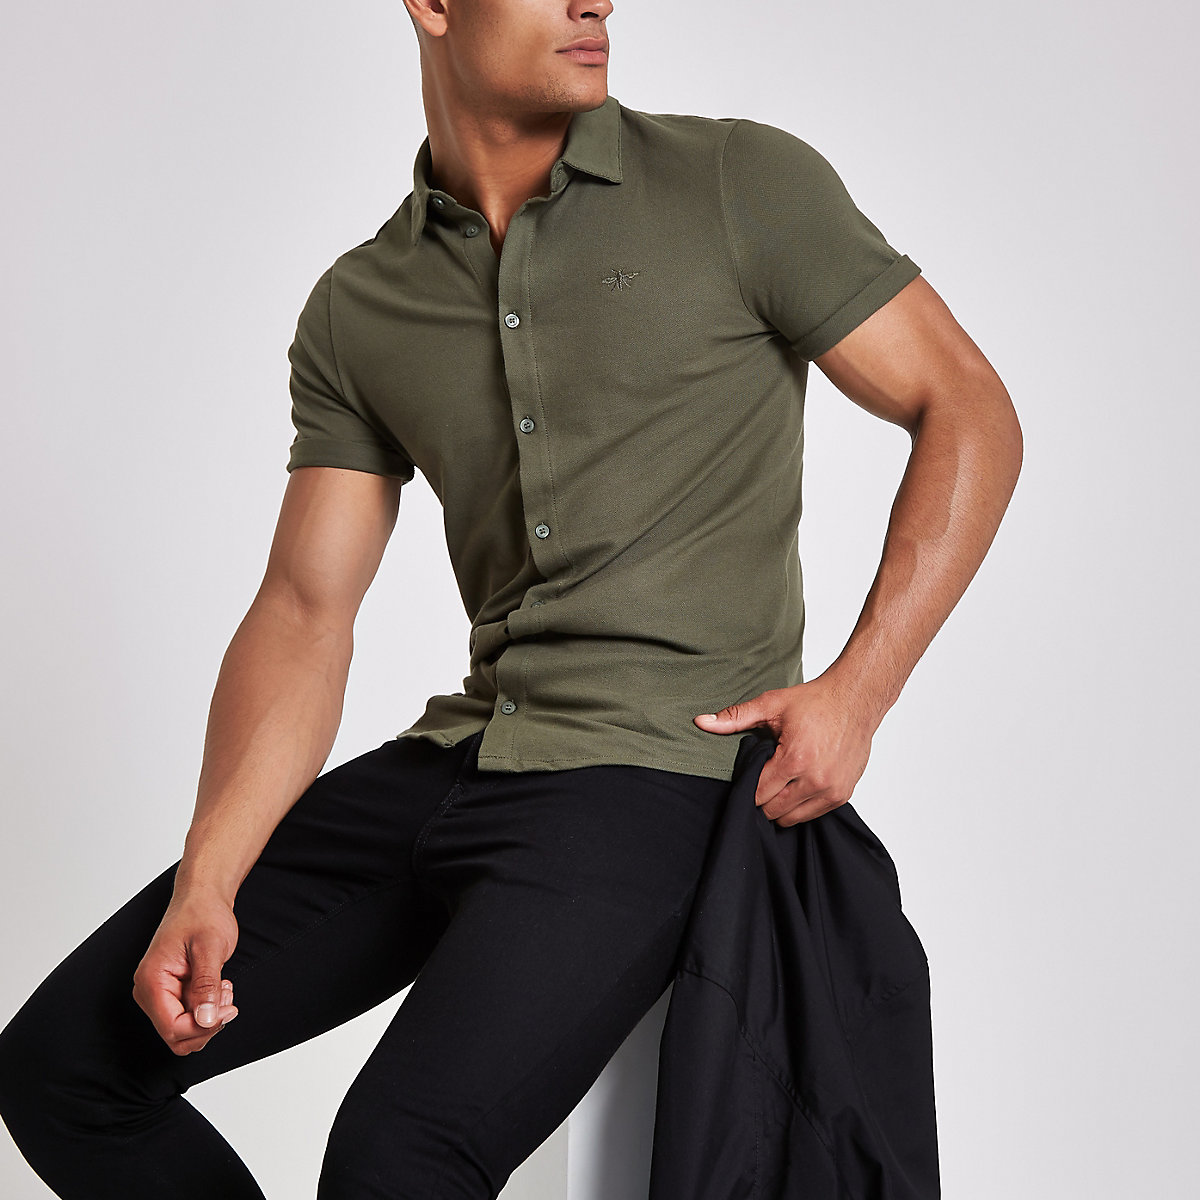 Khaki pique short sleeve muscle fit shirt